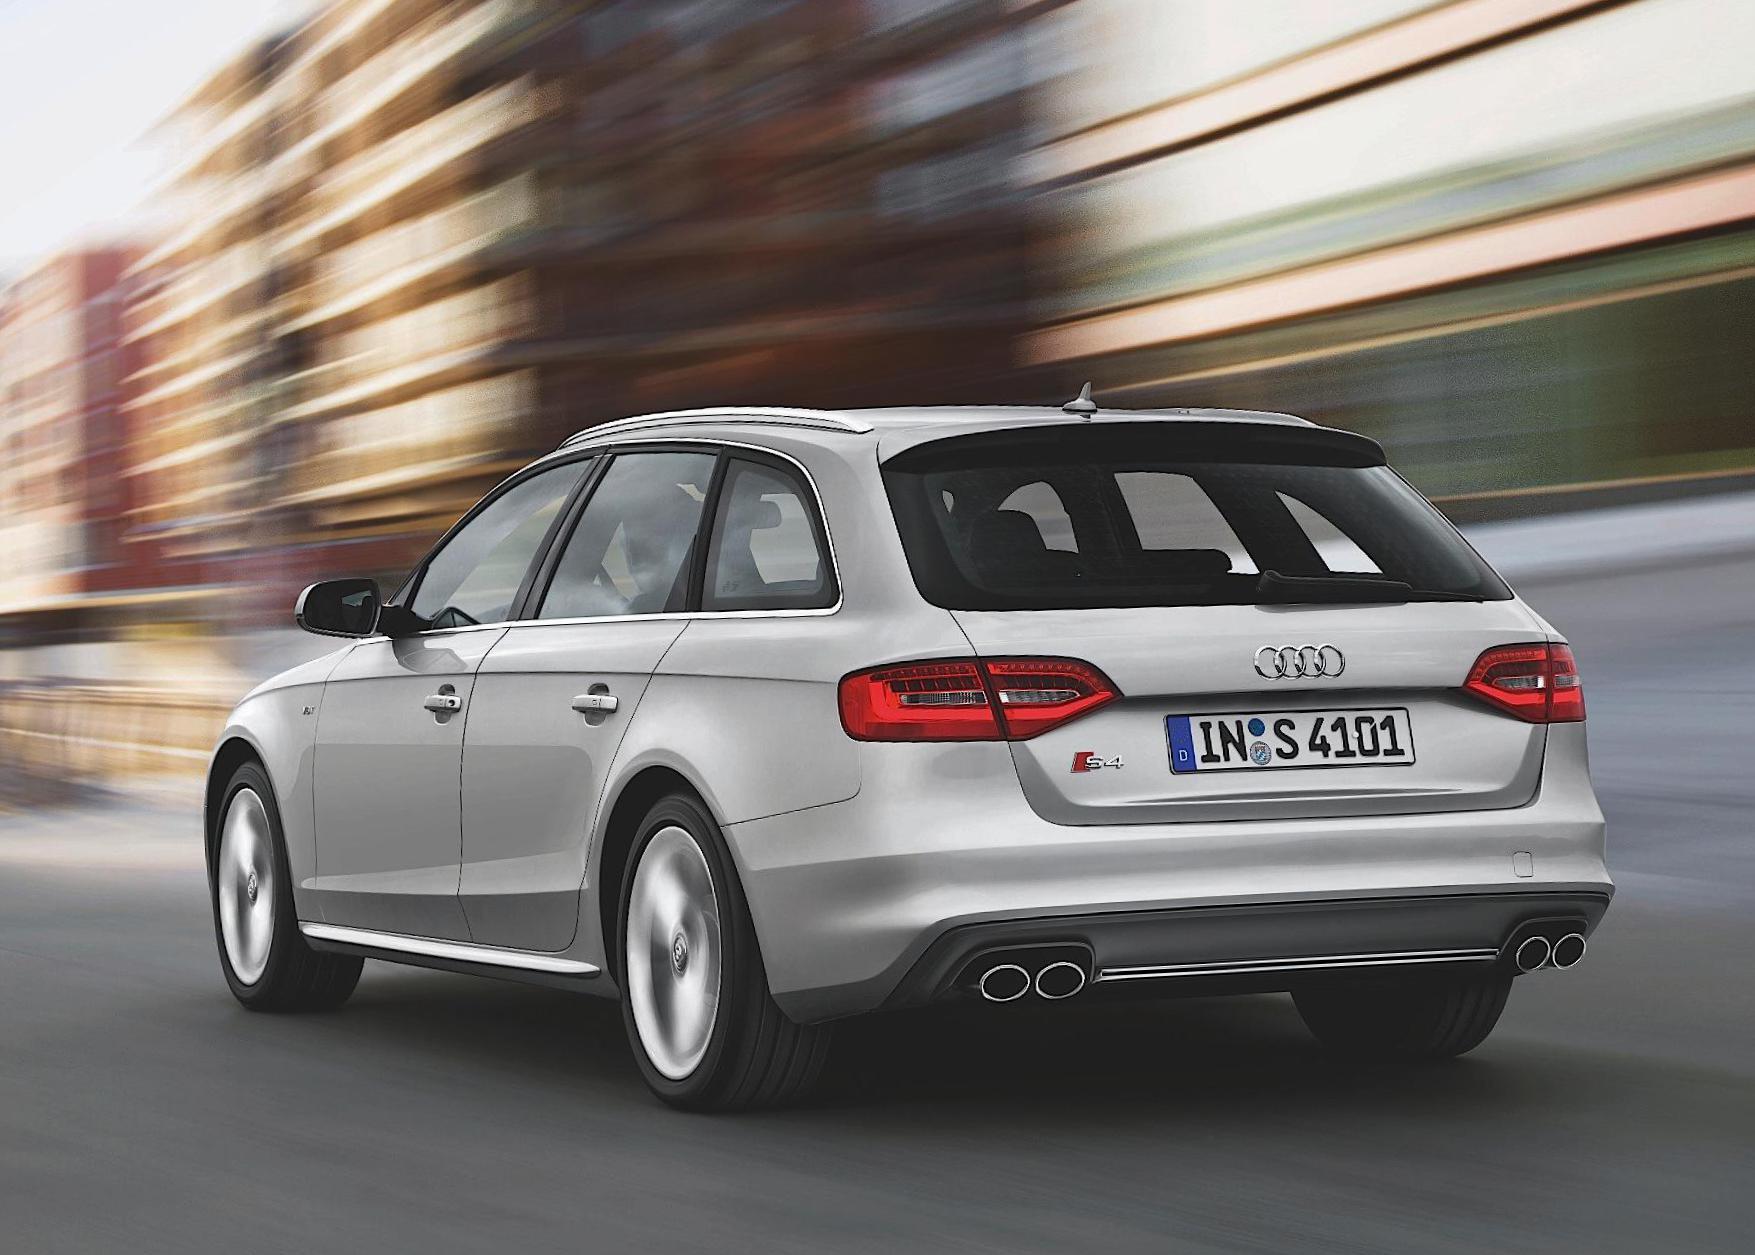 Audi S Avant Photos And Specs Photo Audi S Avant Lease And - Lease audi s4